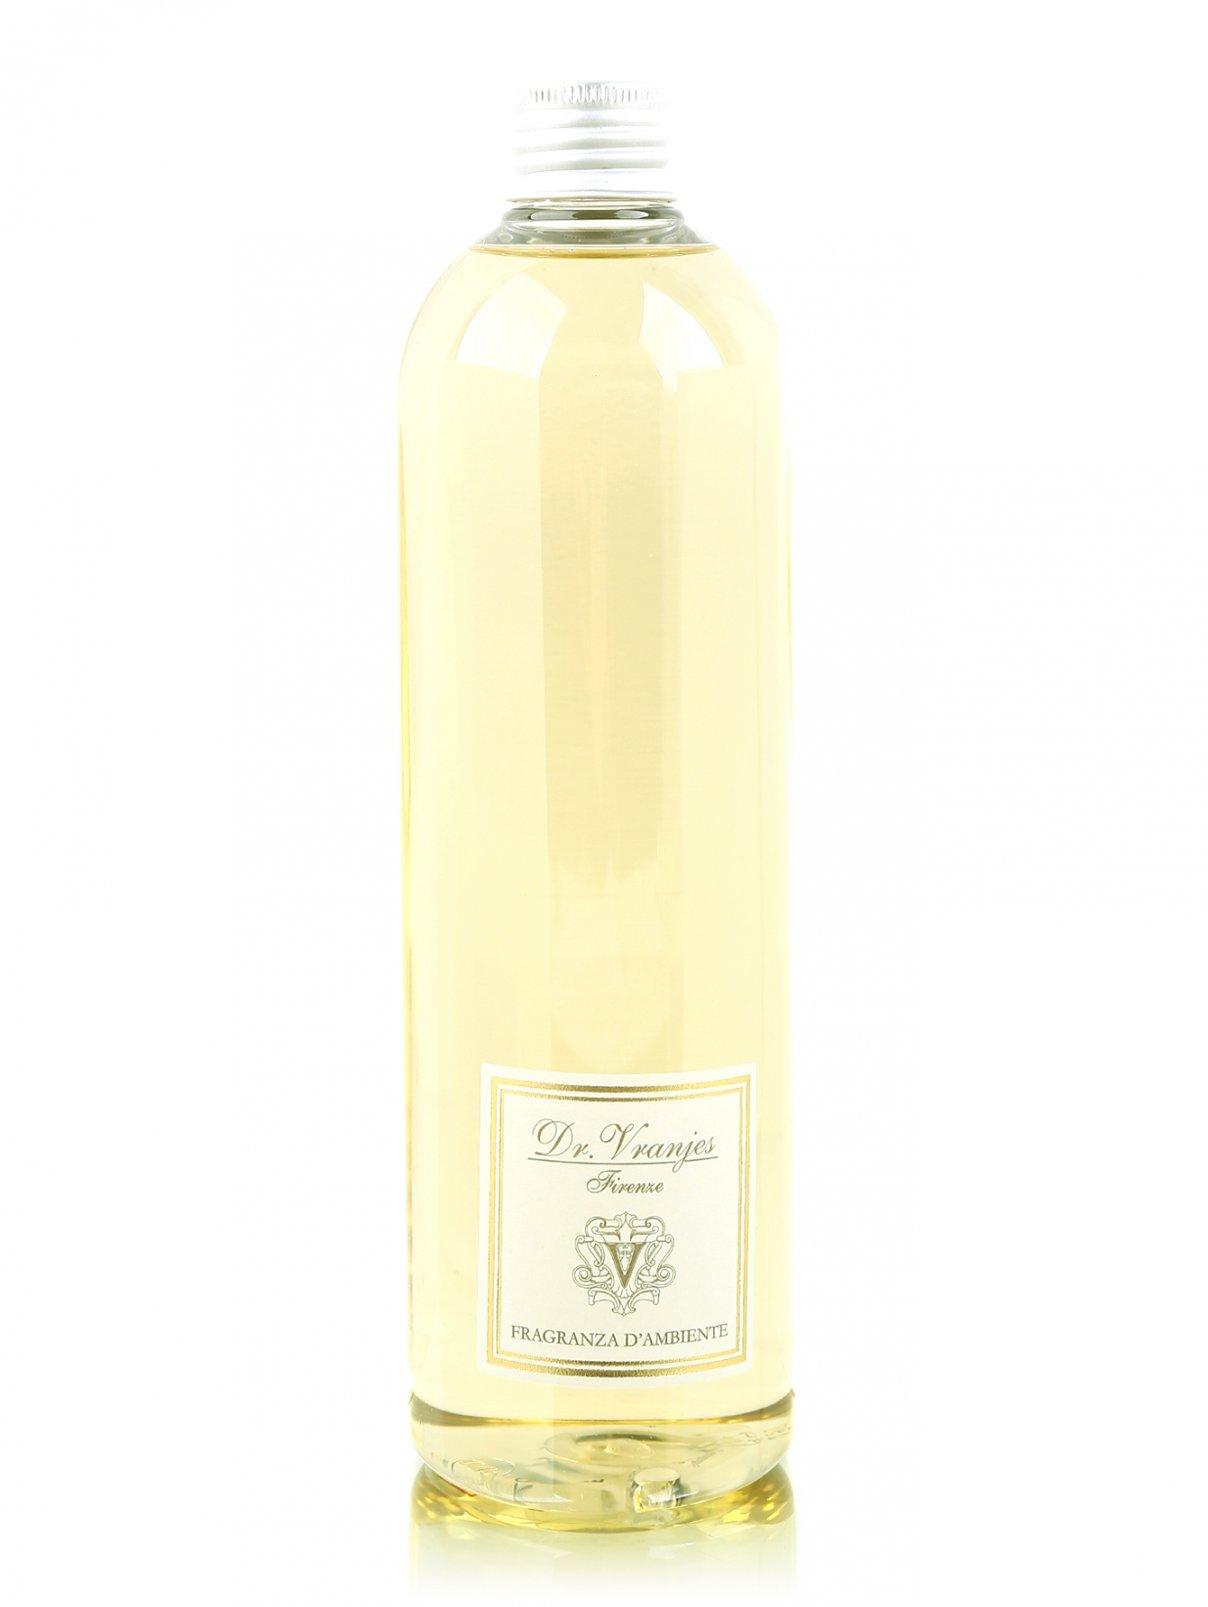 Наполнитель для диффузора Fico Selvatico 500 мл Home Fragrance Dr. Vranjes  –  Общий вид